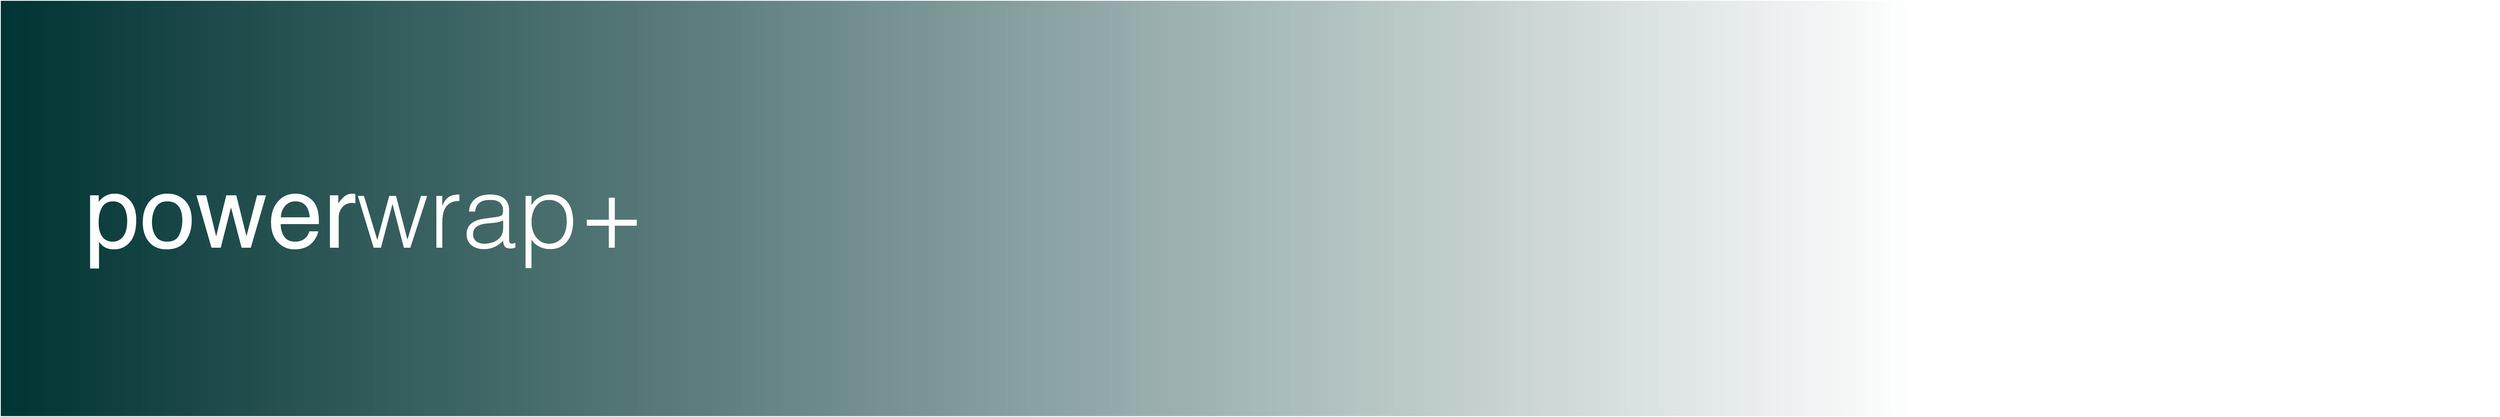 powerwrap+Banner.jpg